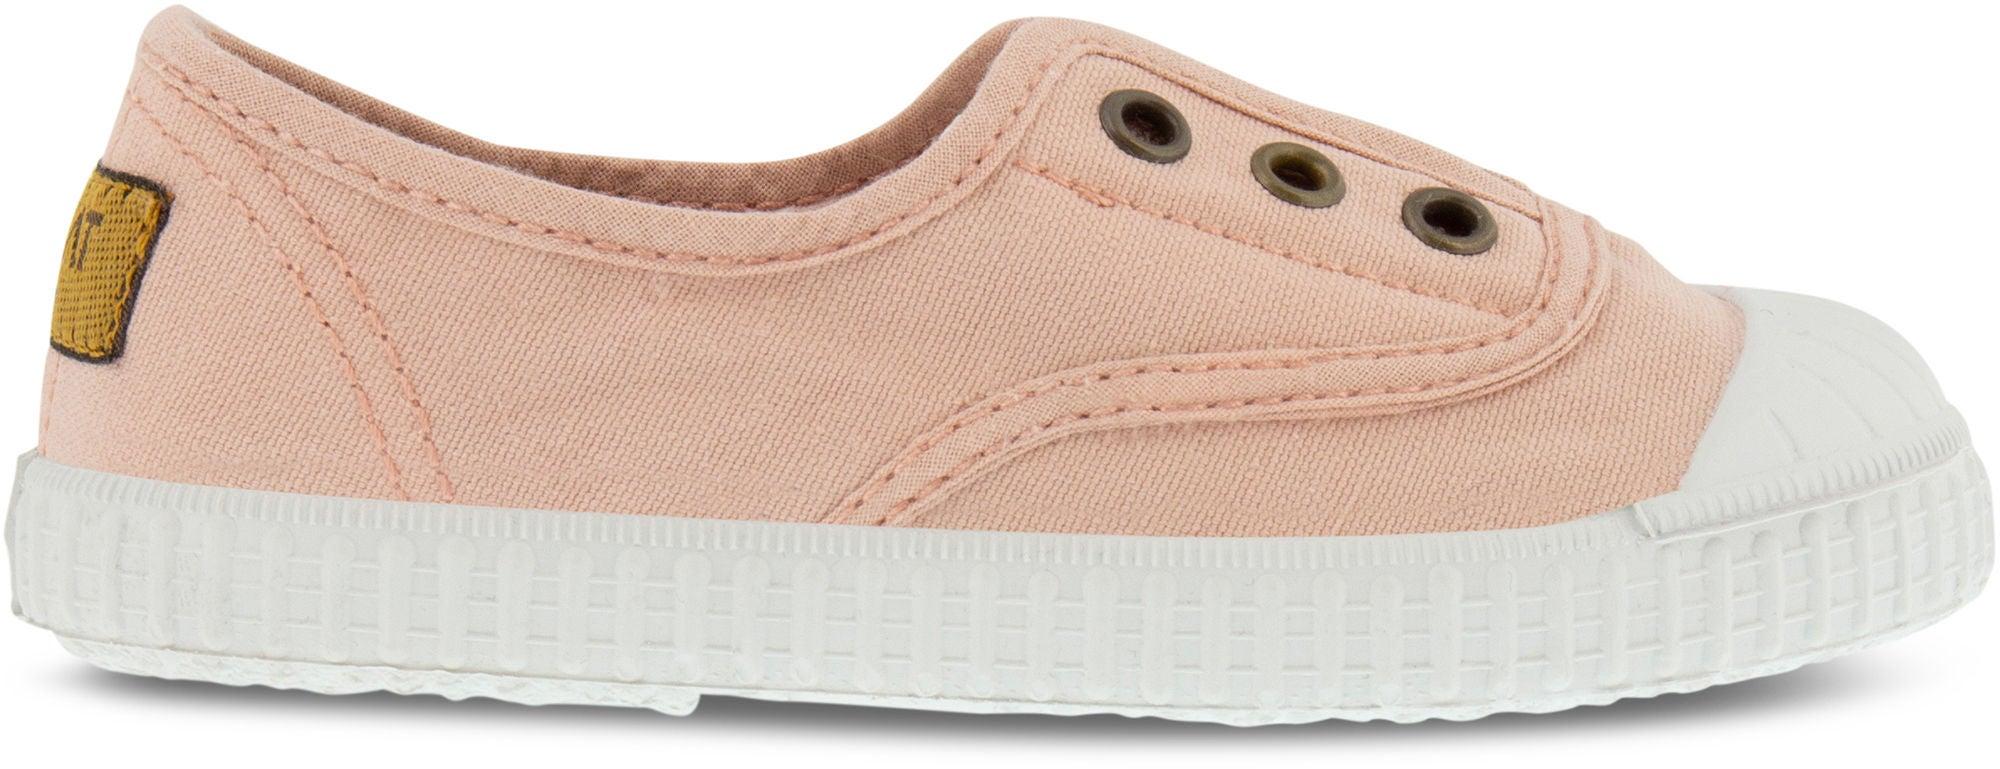 2207b0c1a0b158 Kaufen Kavat Fjällbacka TX Sneaker